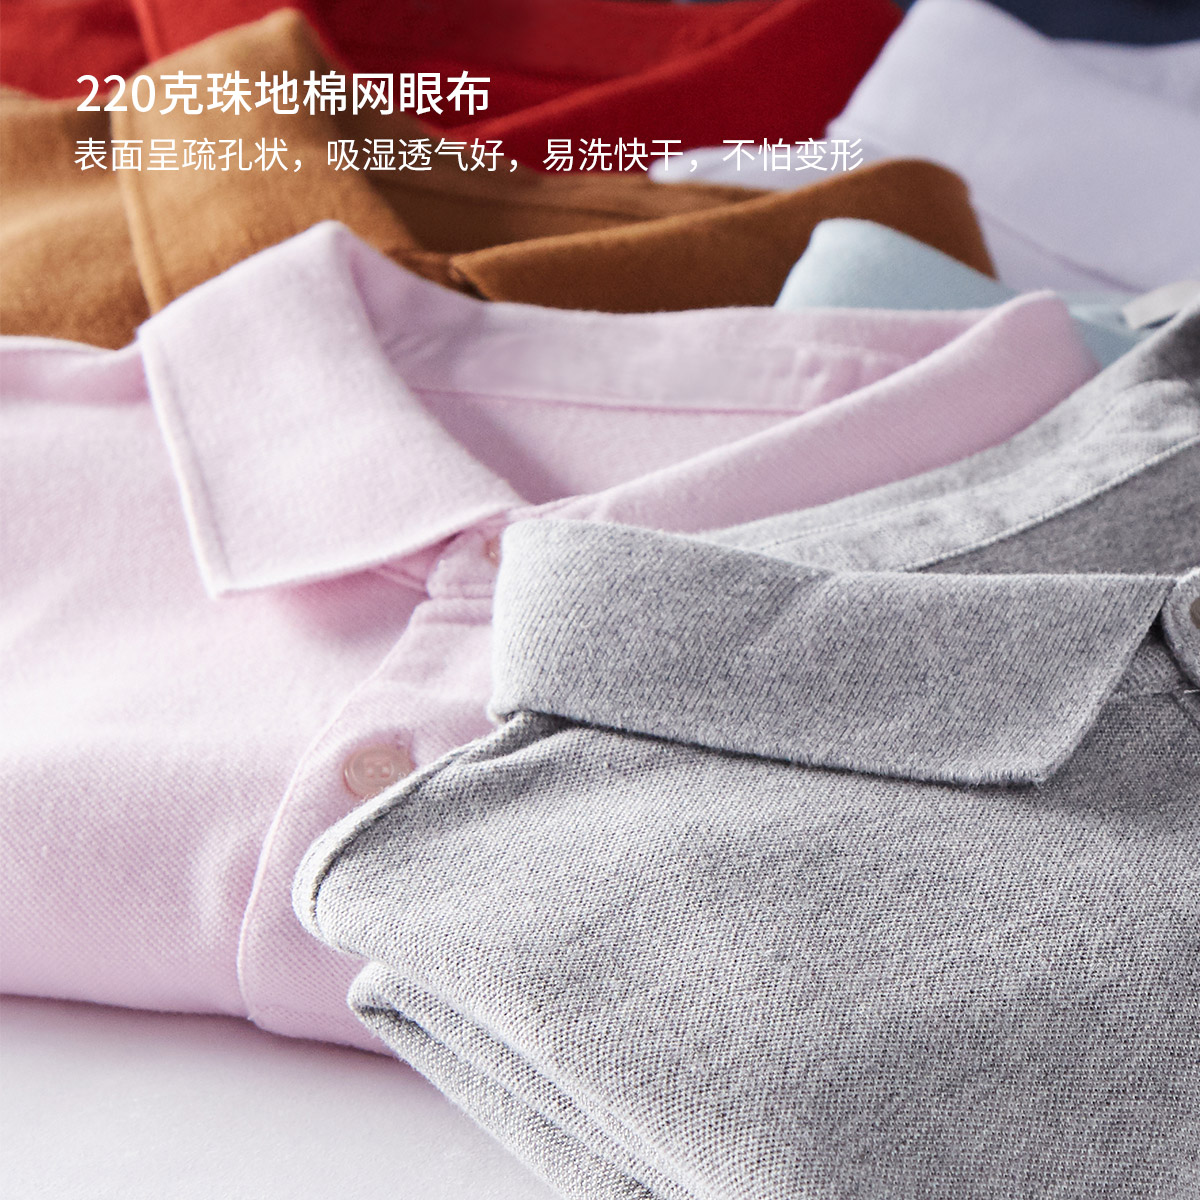 polo衫男短袖纯色翻领T恤夏季男士黑色半袖纯棉男装大码潮流宽松